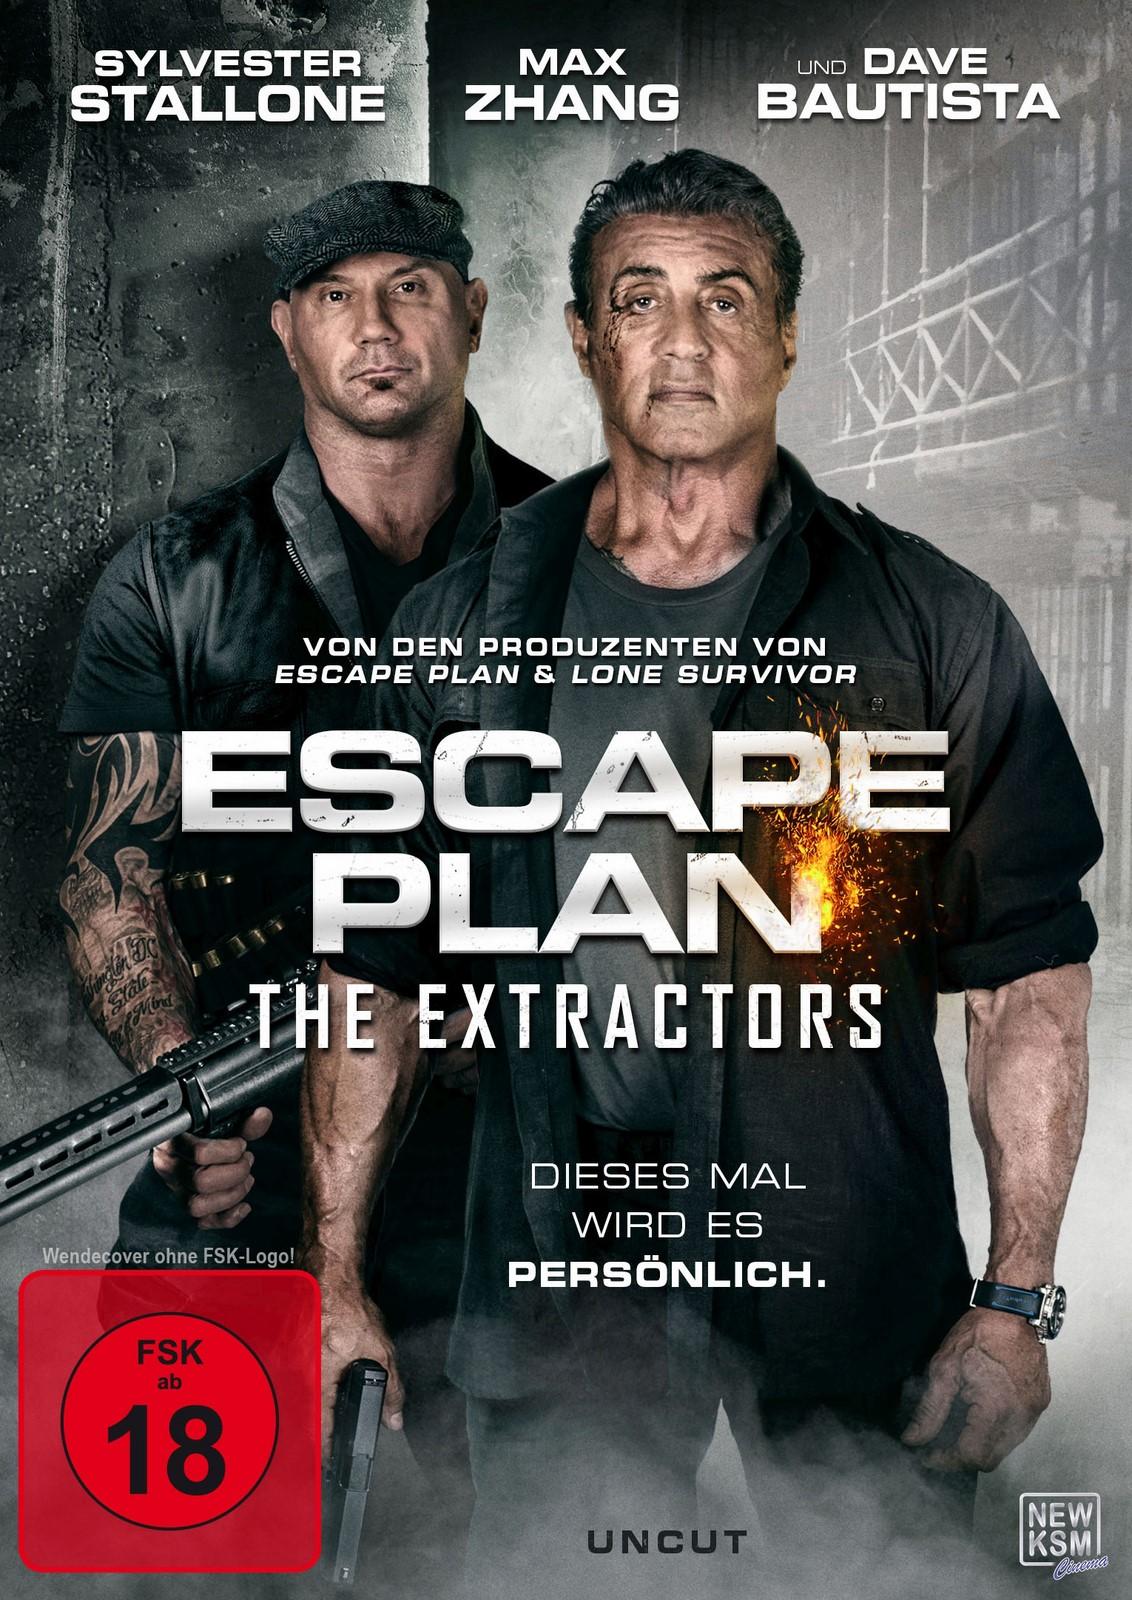 2 - Escape Plan 3: The Extractors